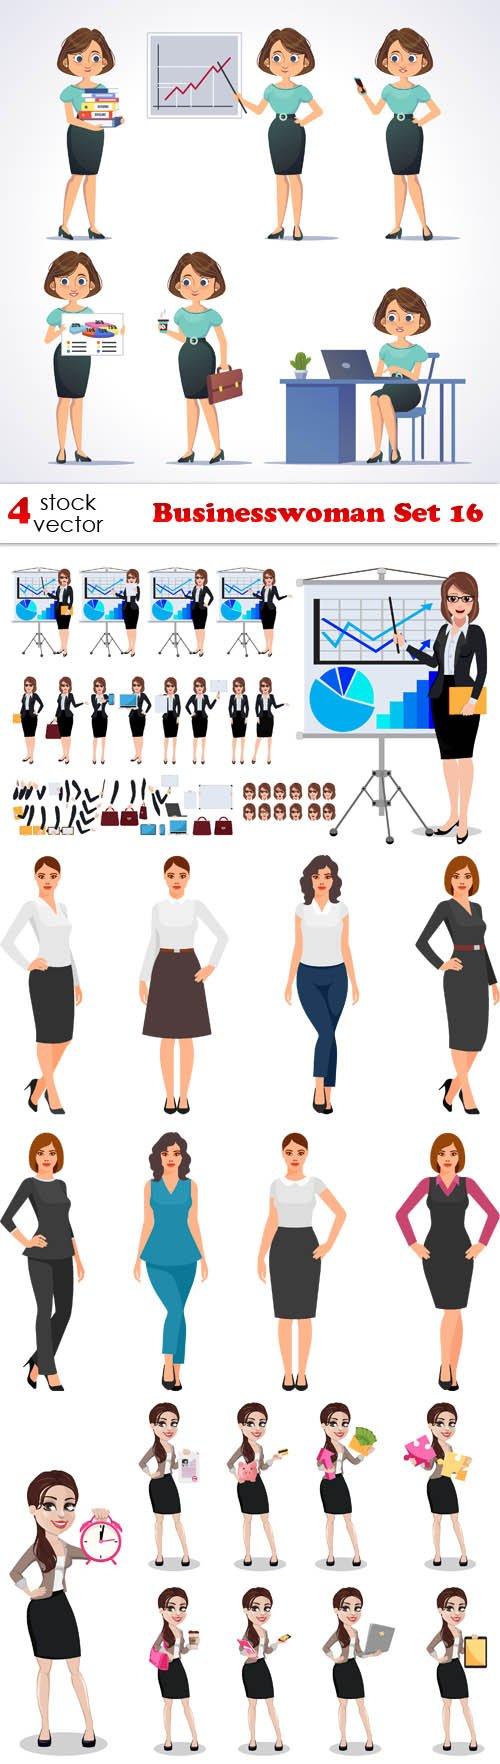 Vectors - Businesswoman Set 16